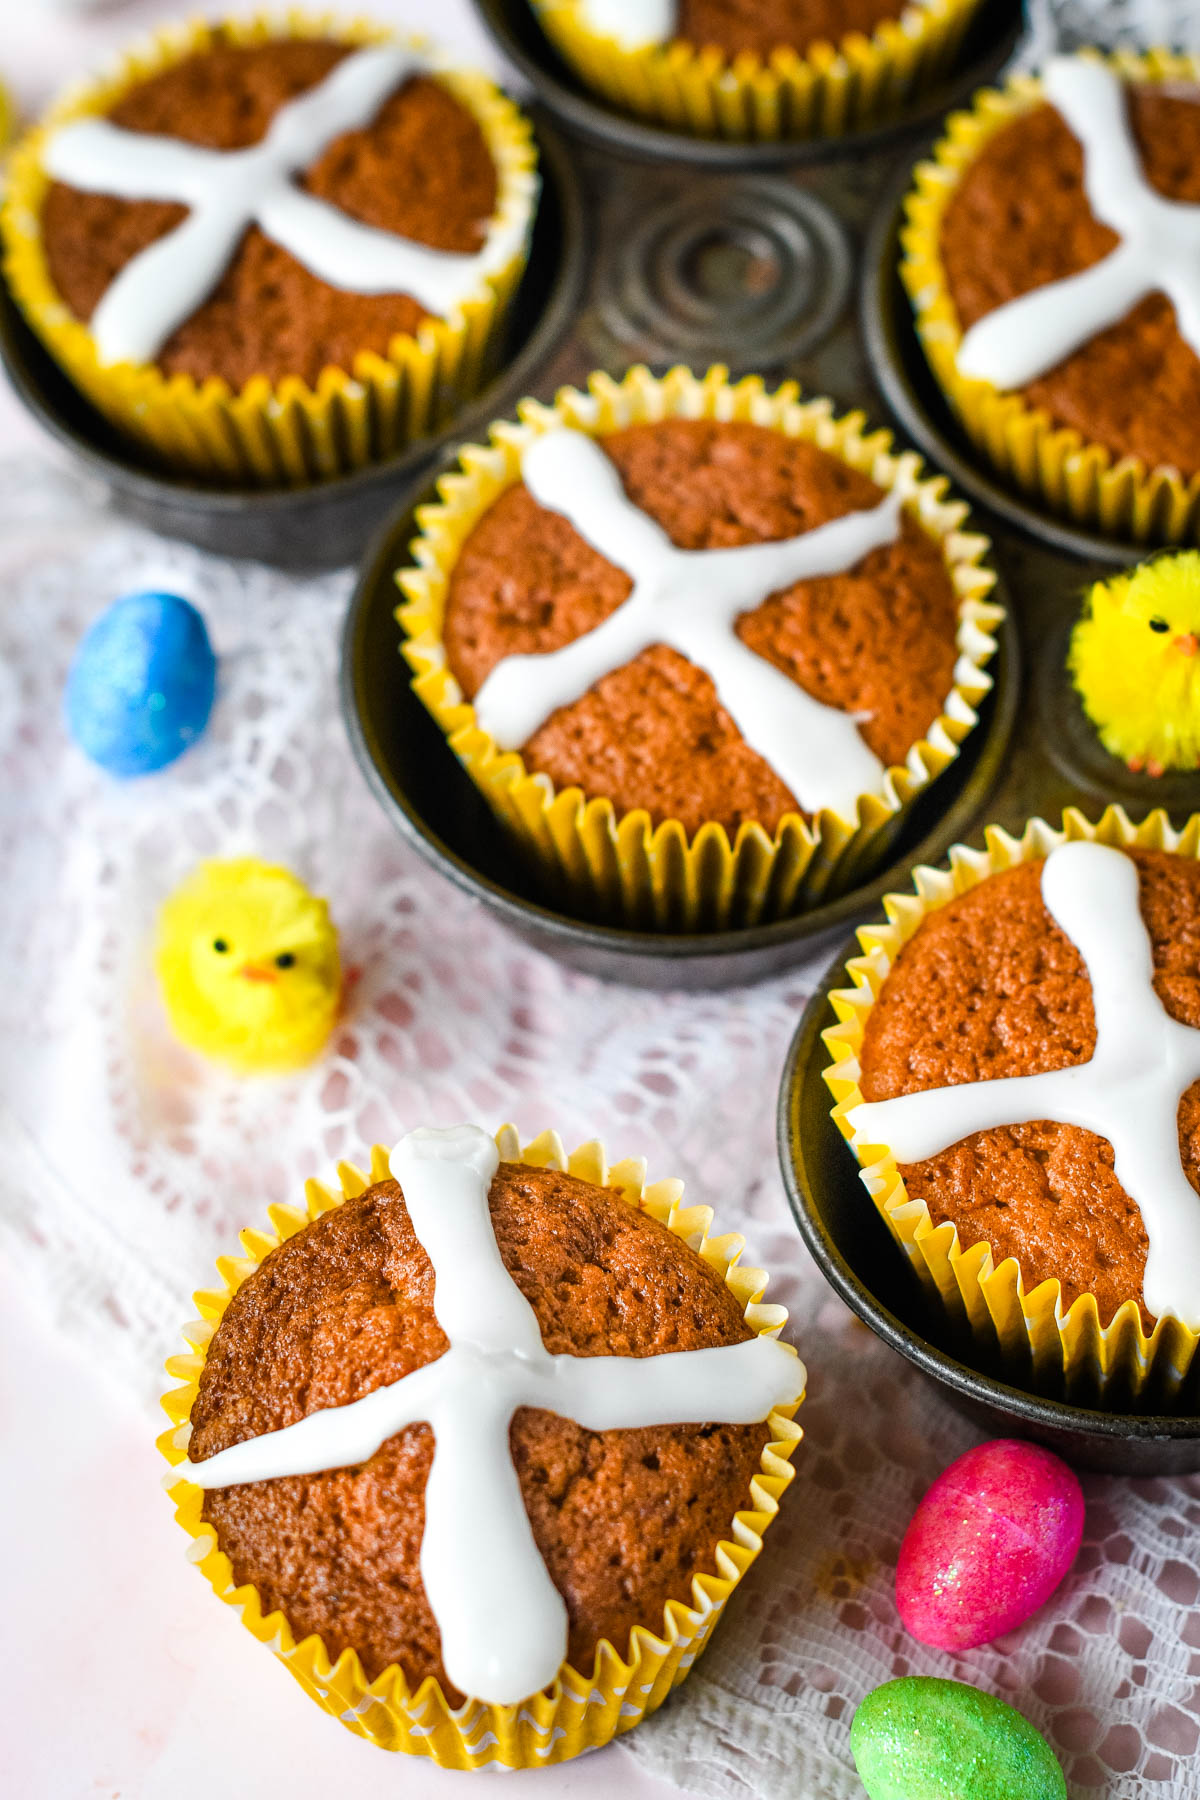 hot cross bun cupcakes in baking tray